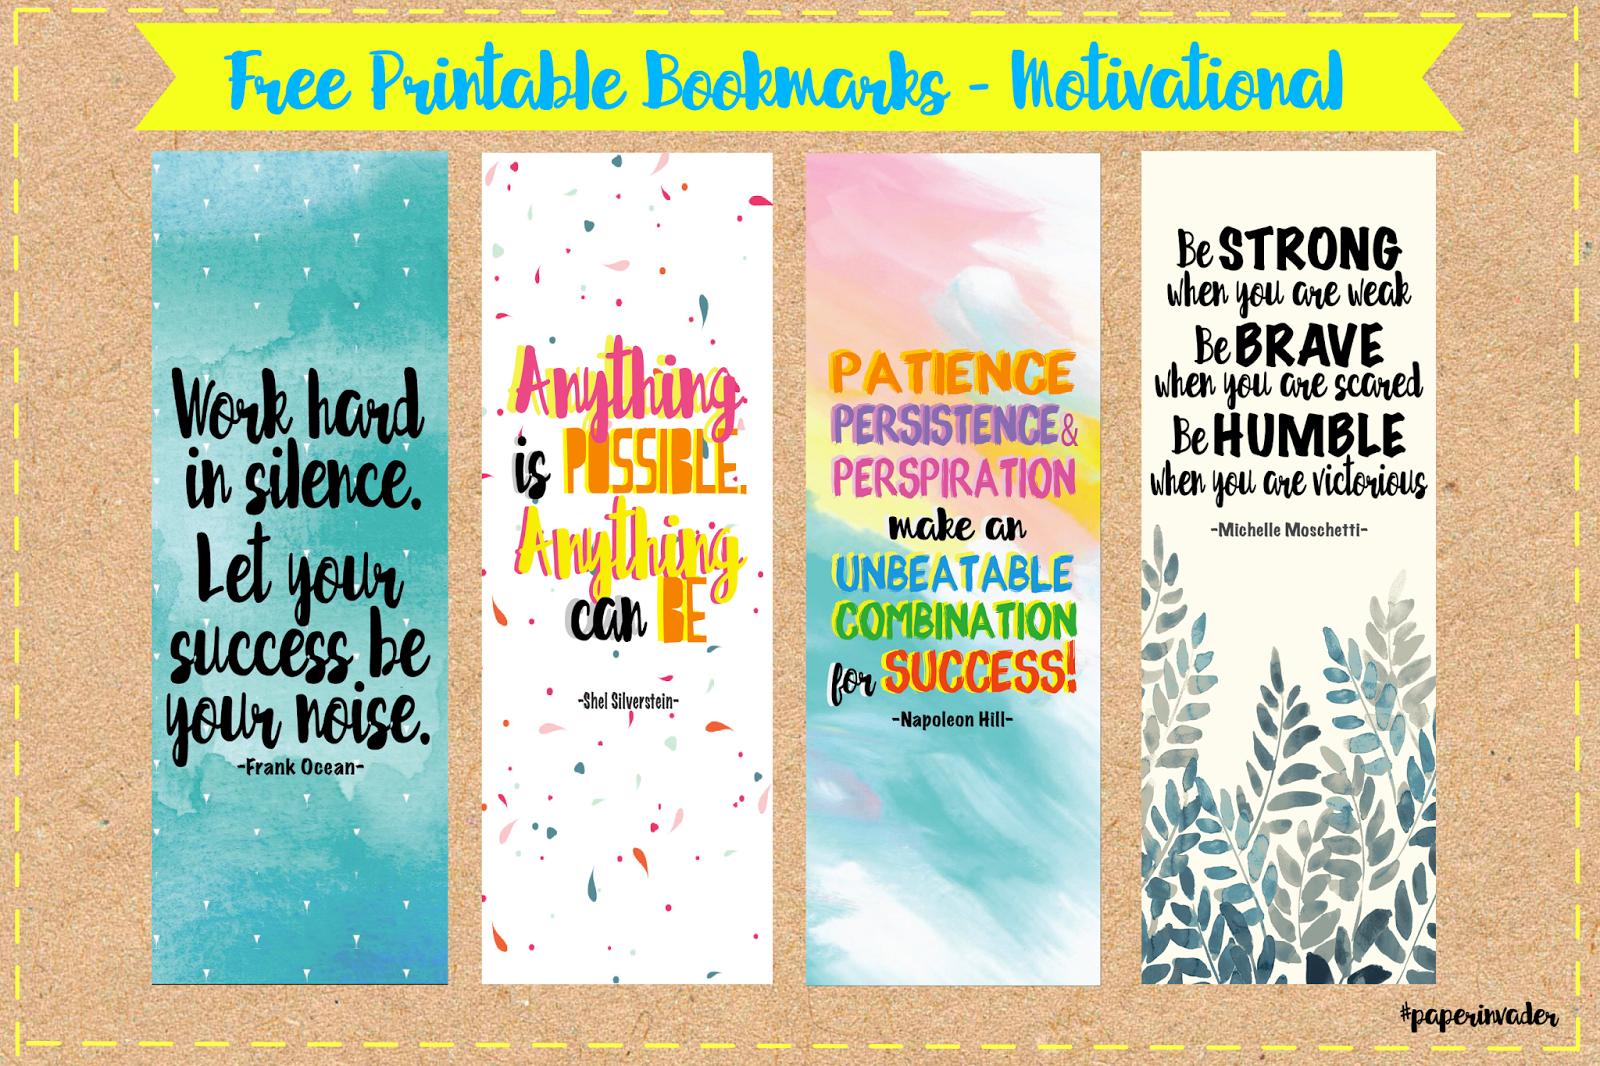 Paper Invader: Free Printable Bookmarks - Motivational - Free Printable Book Marks